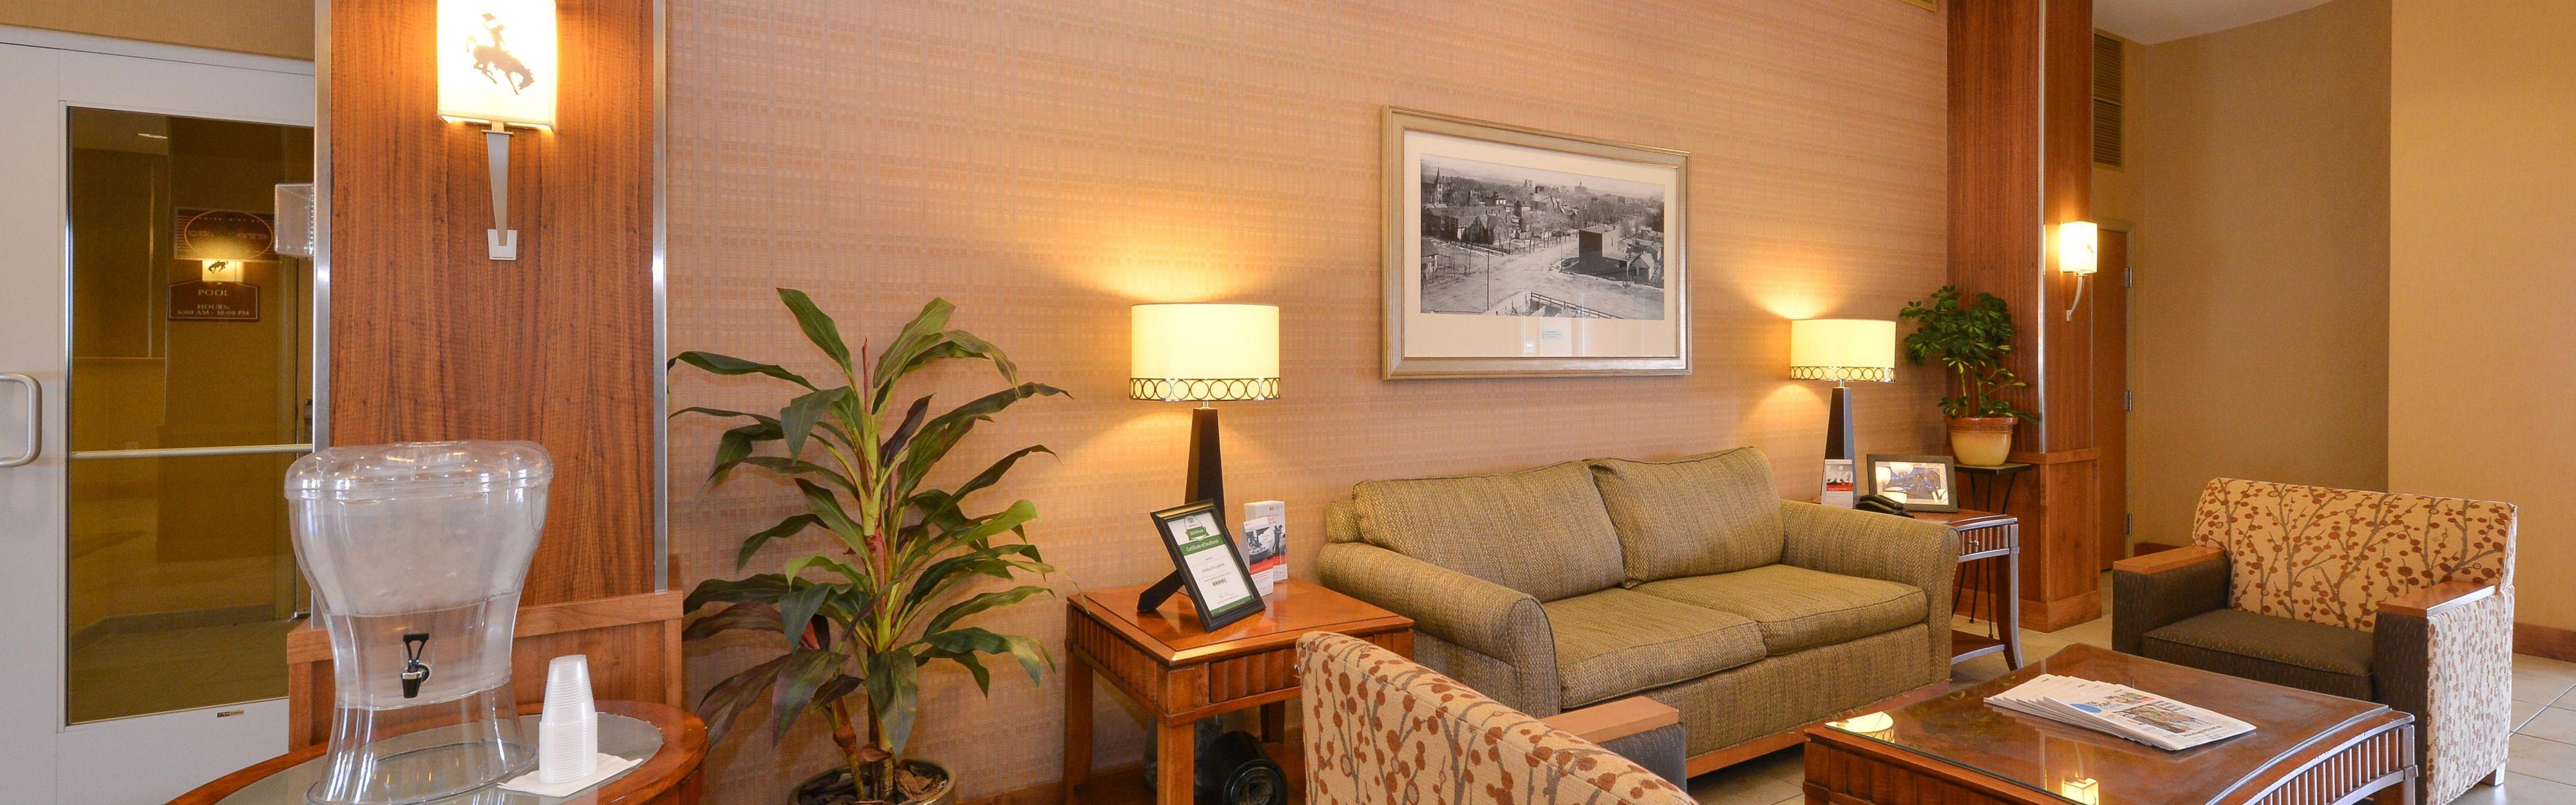 Holiday Inn Laramie   University Area   Hotel Reviews U0026 Photos